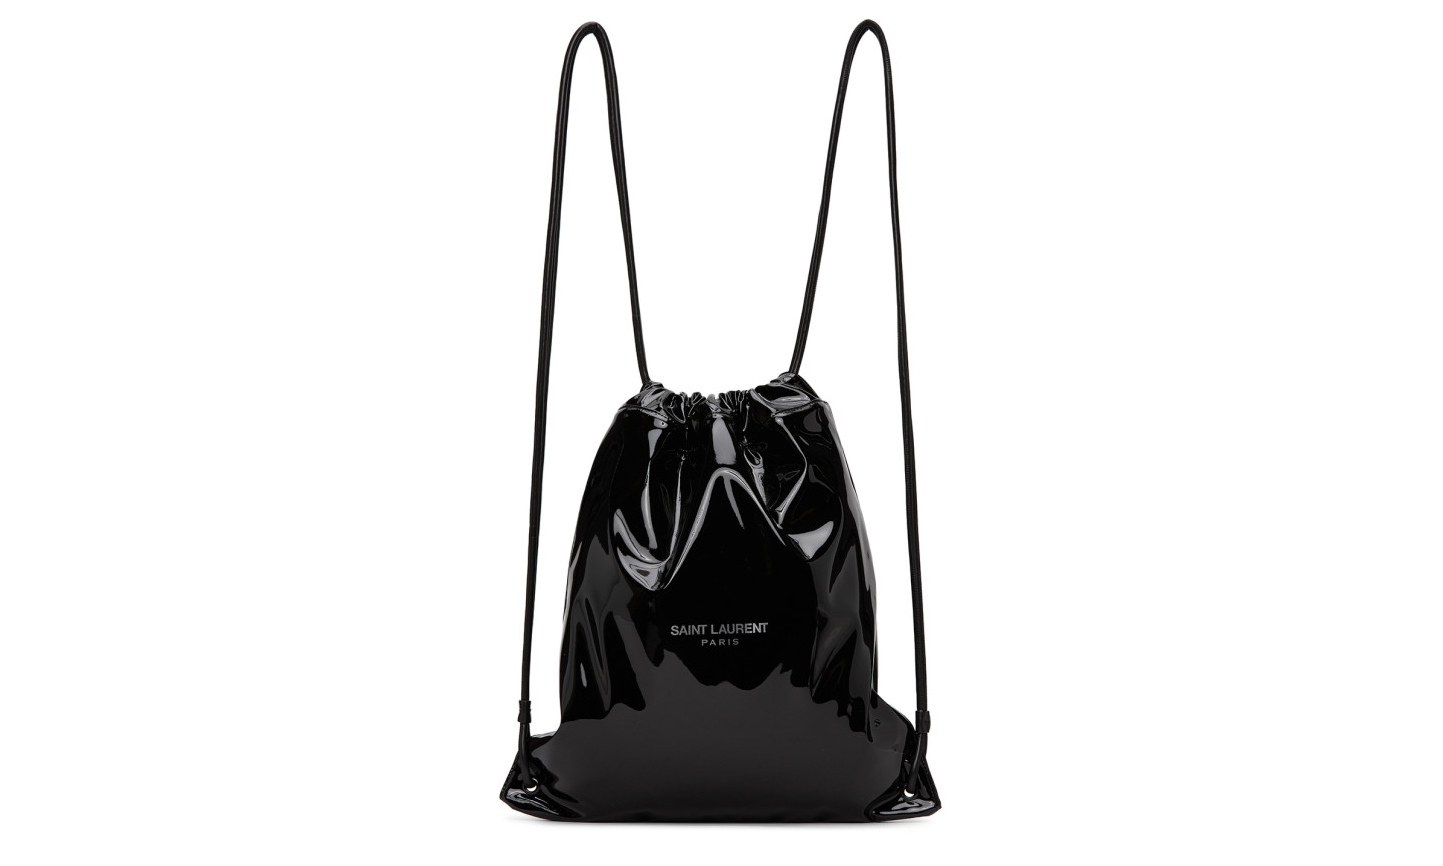 Saint Laurent 推出 Logo 款漆黑束口包袋